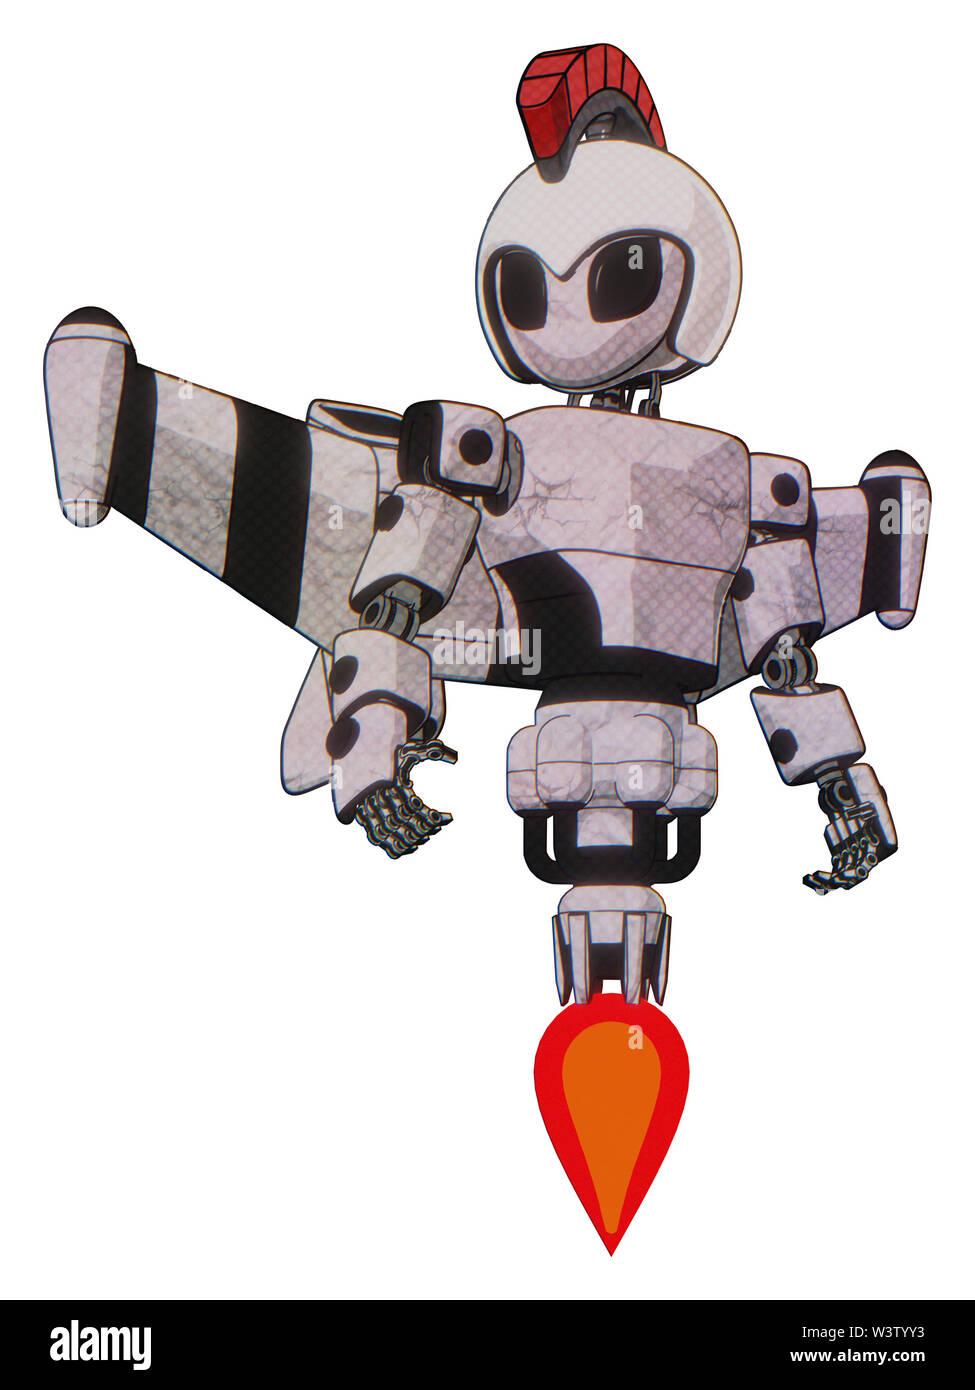 Cyborg containing elements: grey alien style head, black eyes, galea roman soldier ornament, helmet, light chest exoshielding, prototype exoplate ches - Stock Image